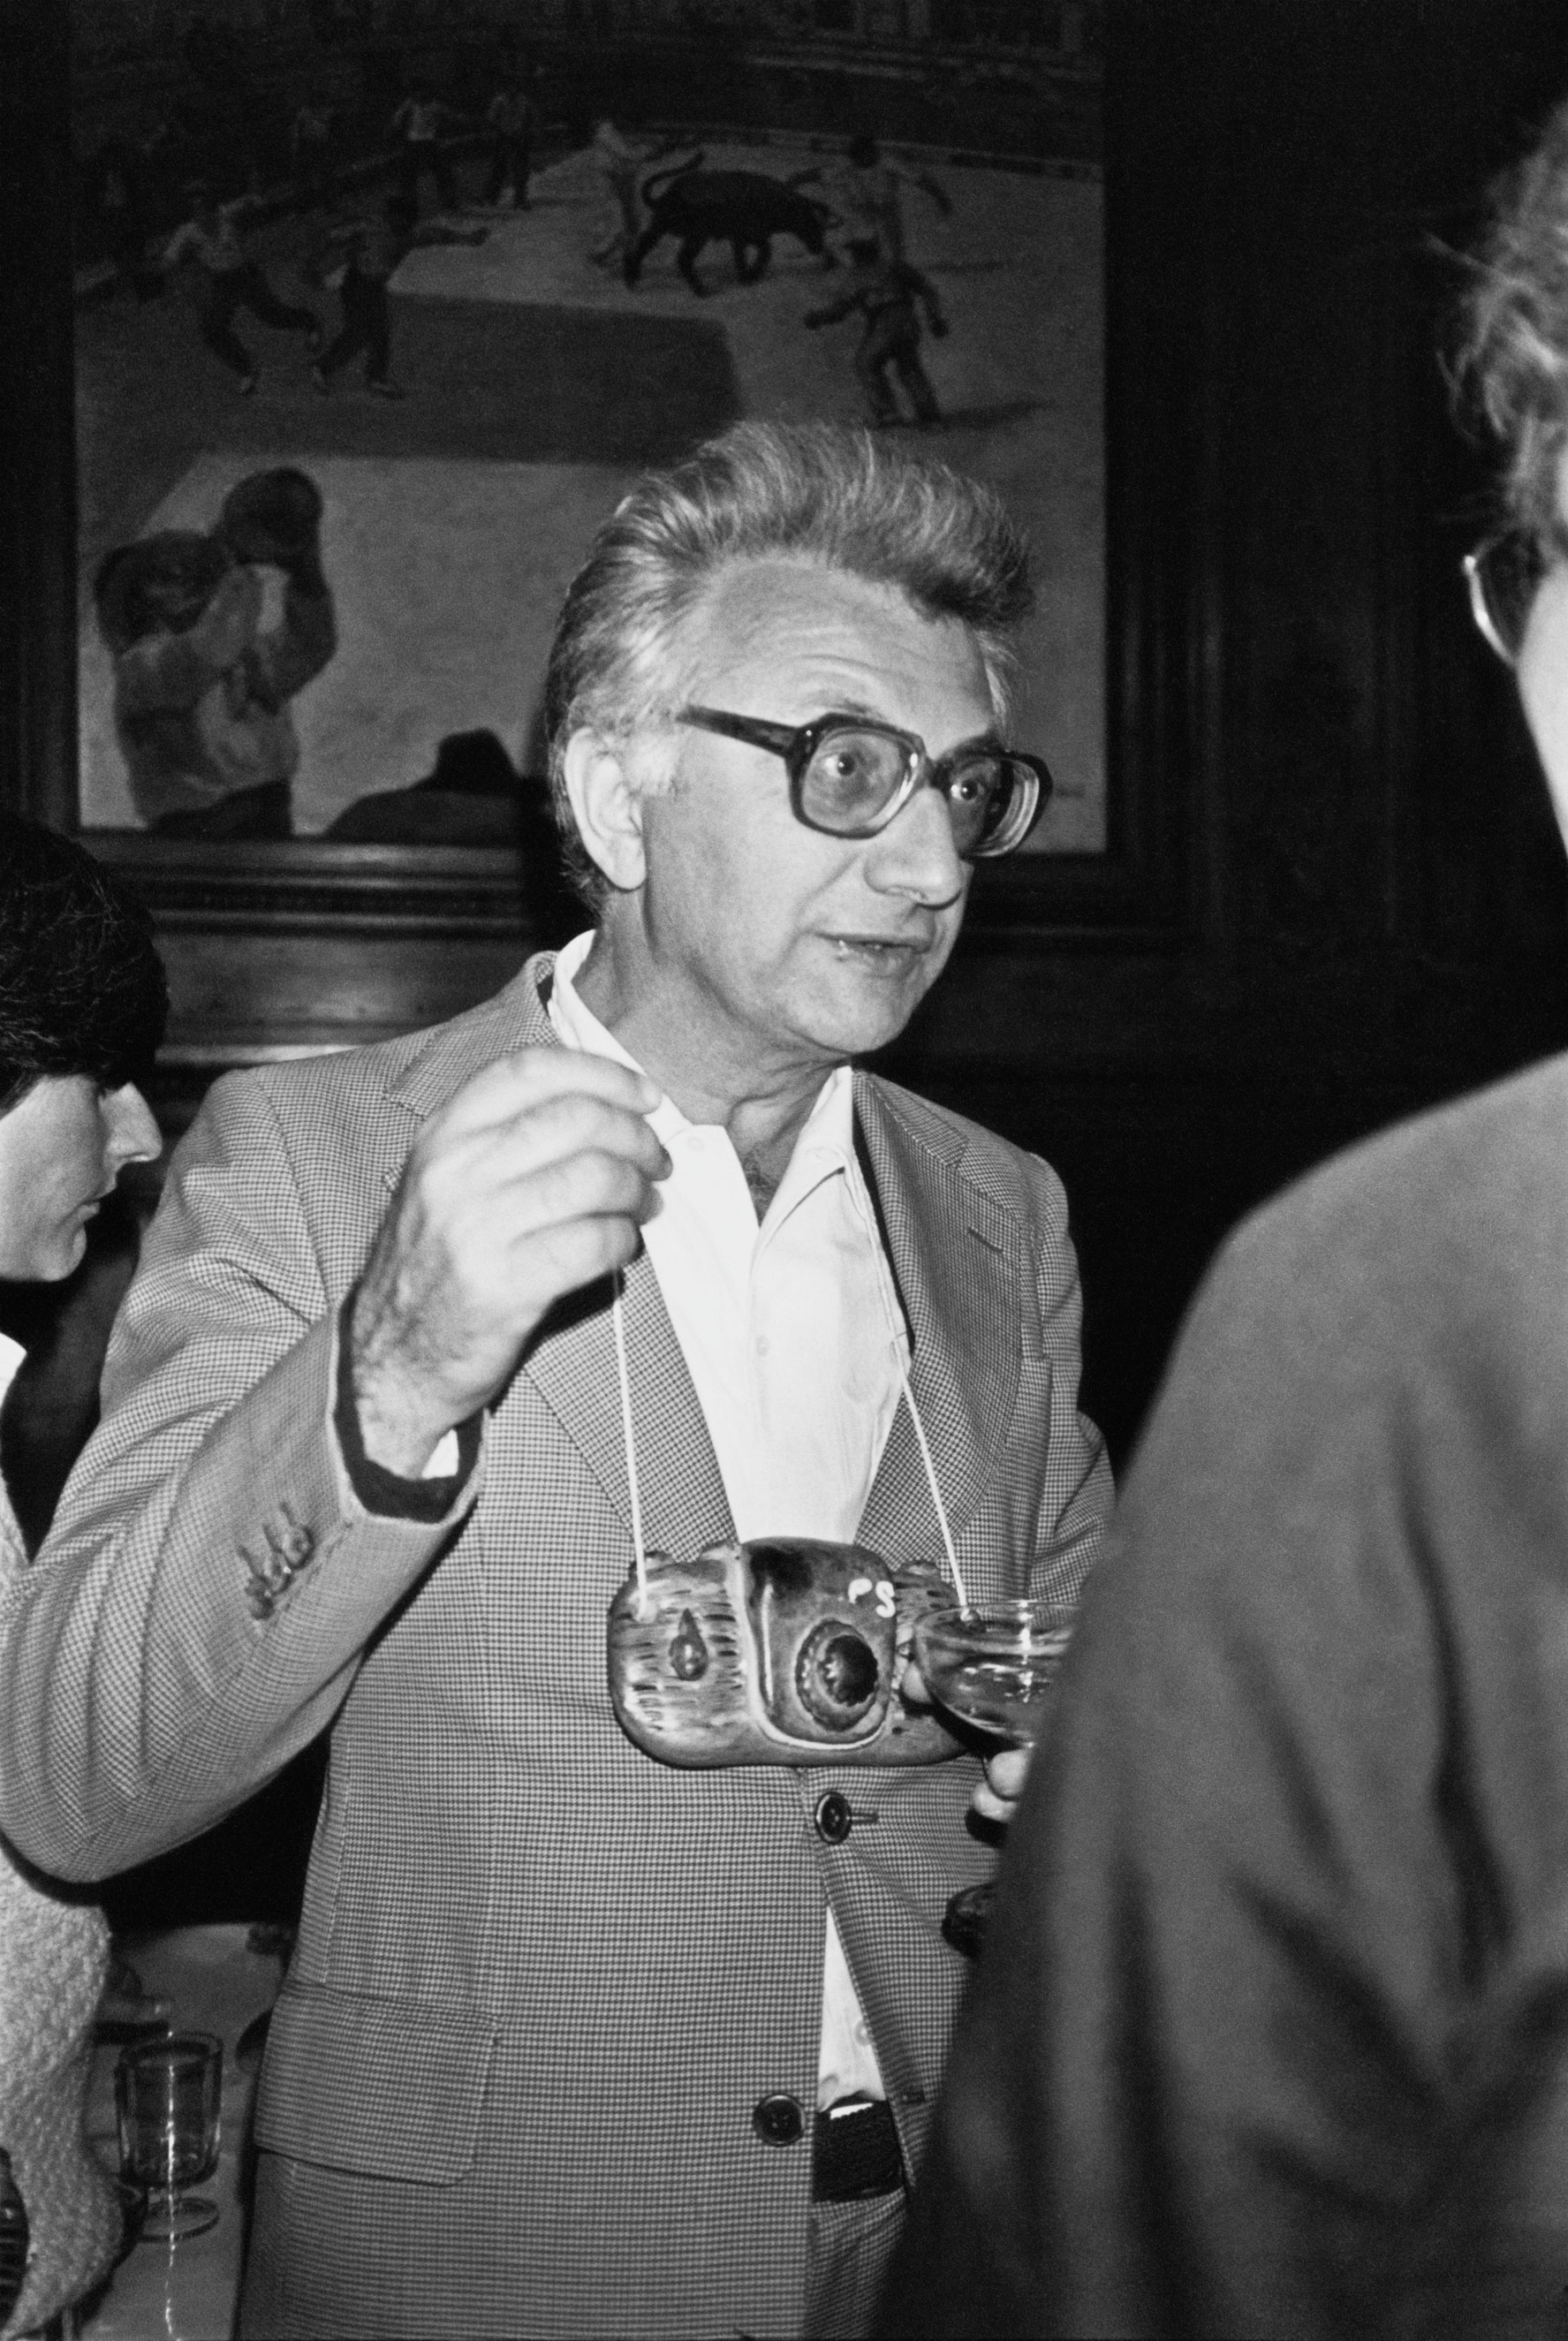 Lucien Clergue in Arles, France in July 1980.